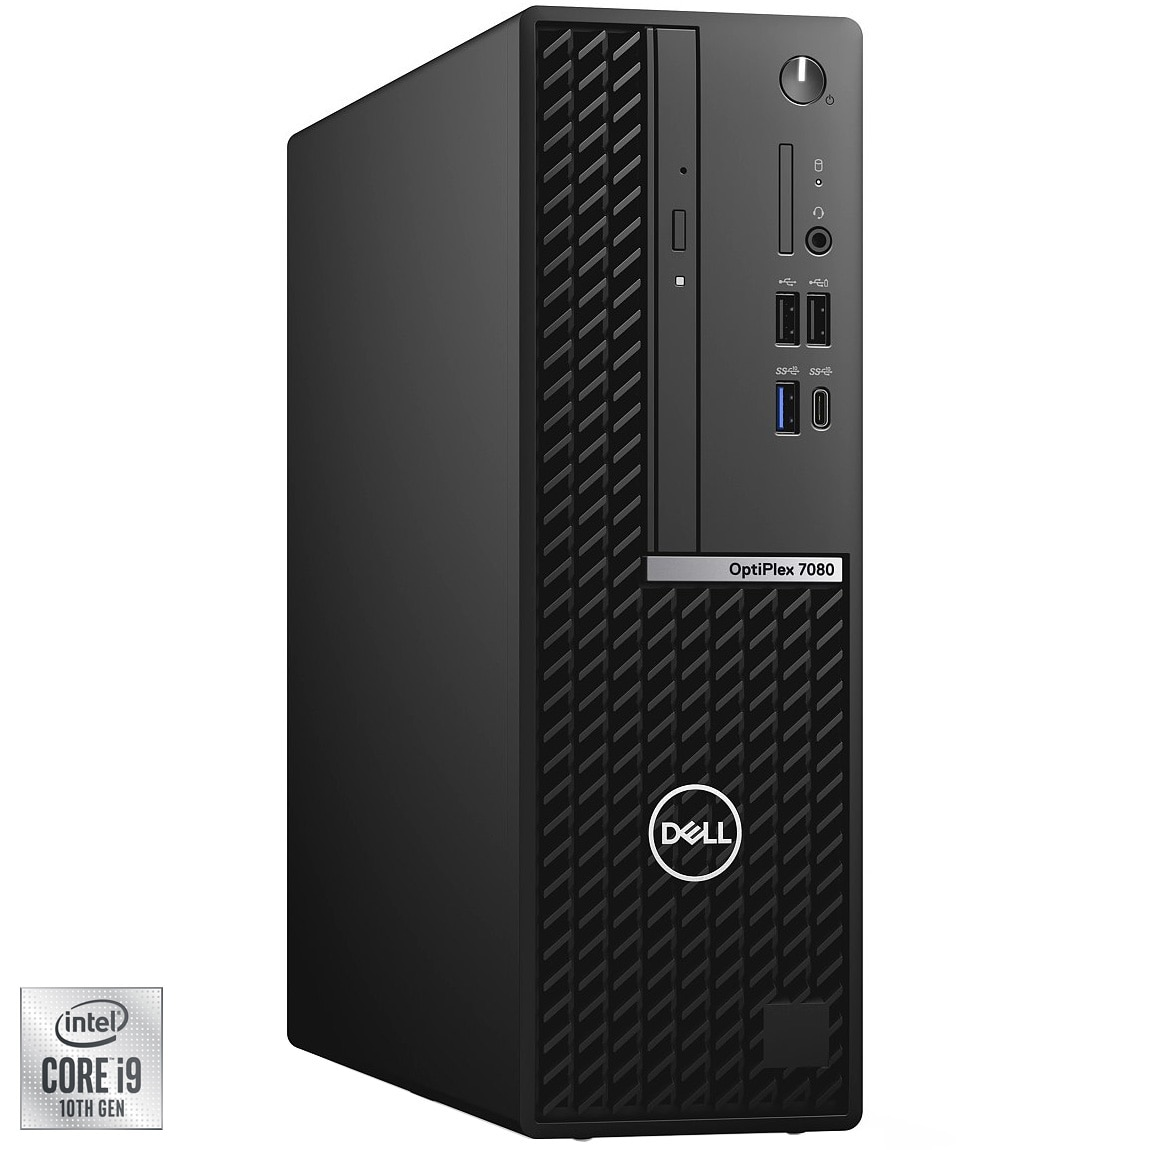 Fotografie Sistem Desktop Dell OptiPlex 7080 SFF cu procesor Intel® Core™ i9-10900 pana la 5.20 GHz, Comet Lake, 32GB DDR4, 512GB SSD, Intel® UHD Graphics 630, Windows 10 Pro